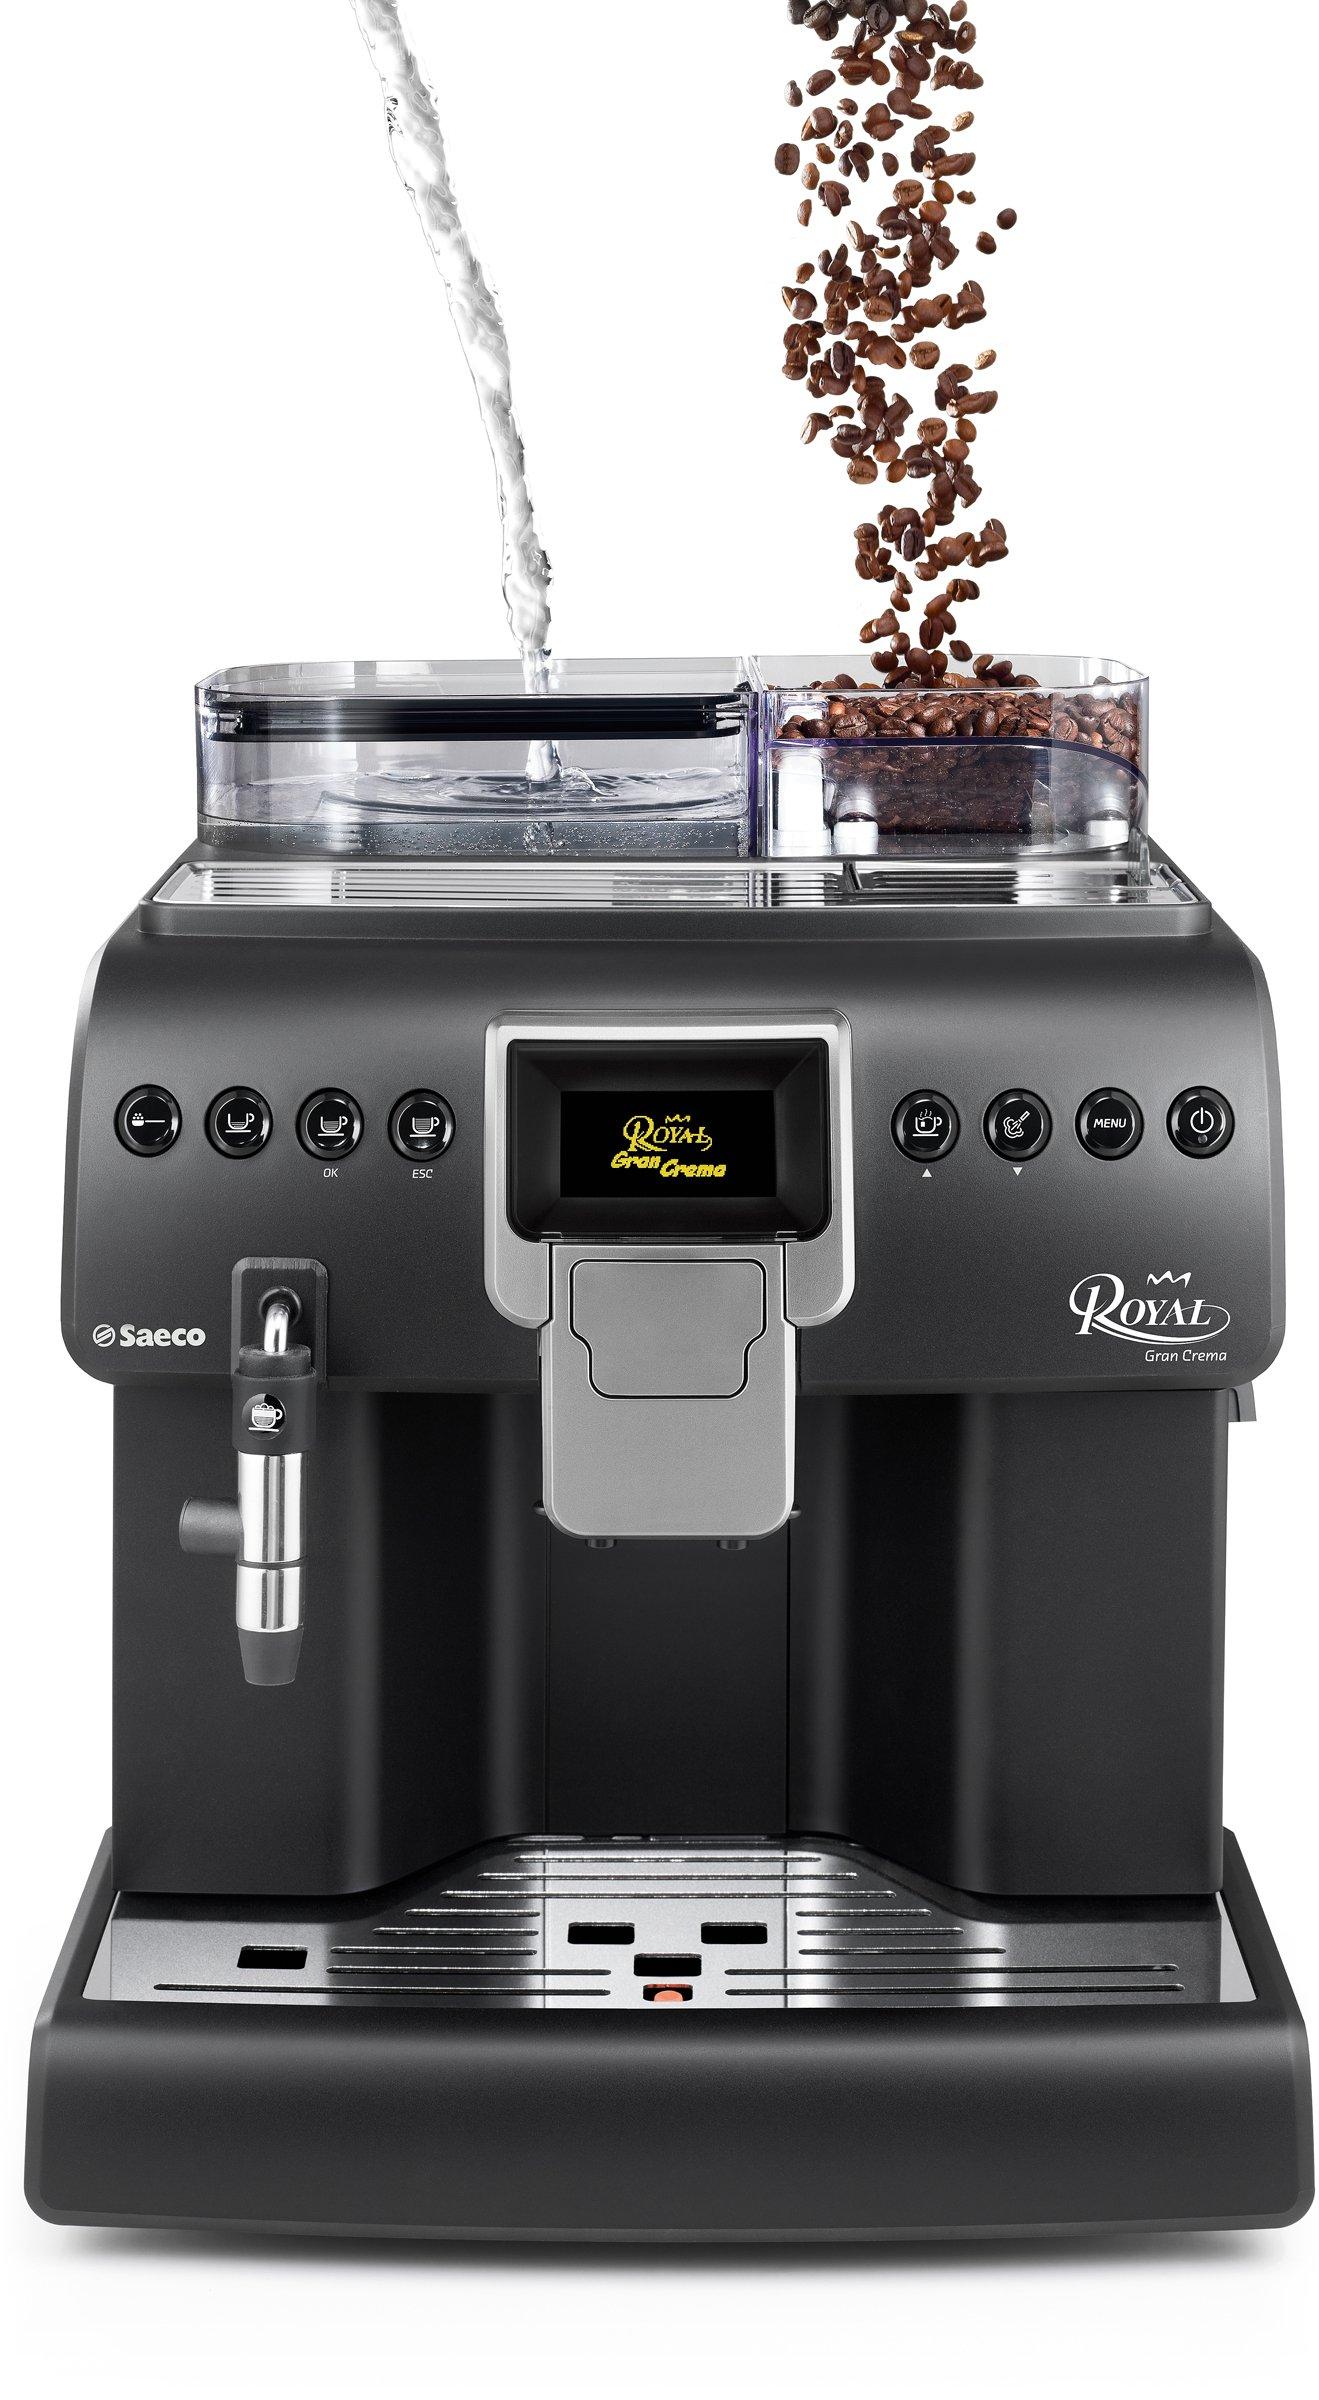 Saeco-HD892001-Kaffee-Vollautomat-Royal-Gran-Crema-Cappuccinatore-Memo-Funktion-Tassenwrmer-groe-Kapazitten-1400-W-matt-schwarz